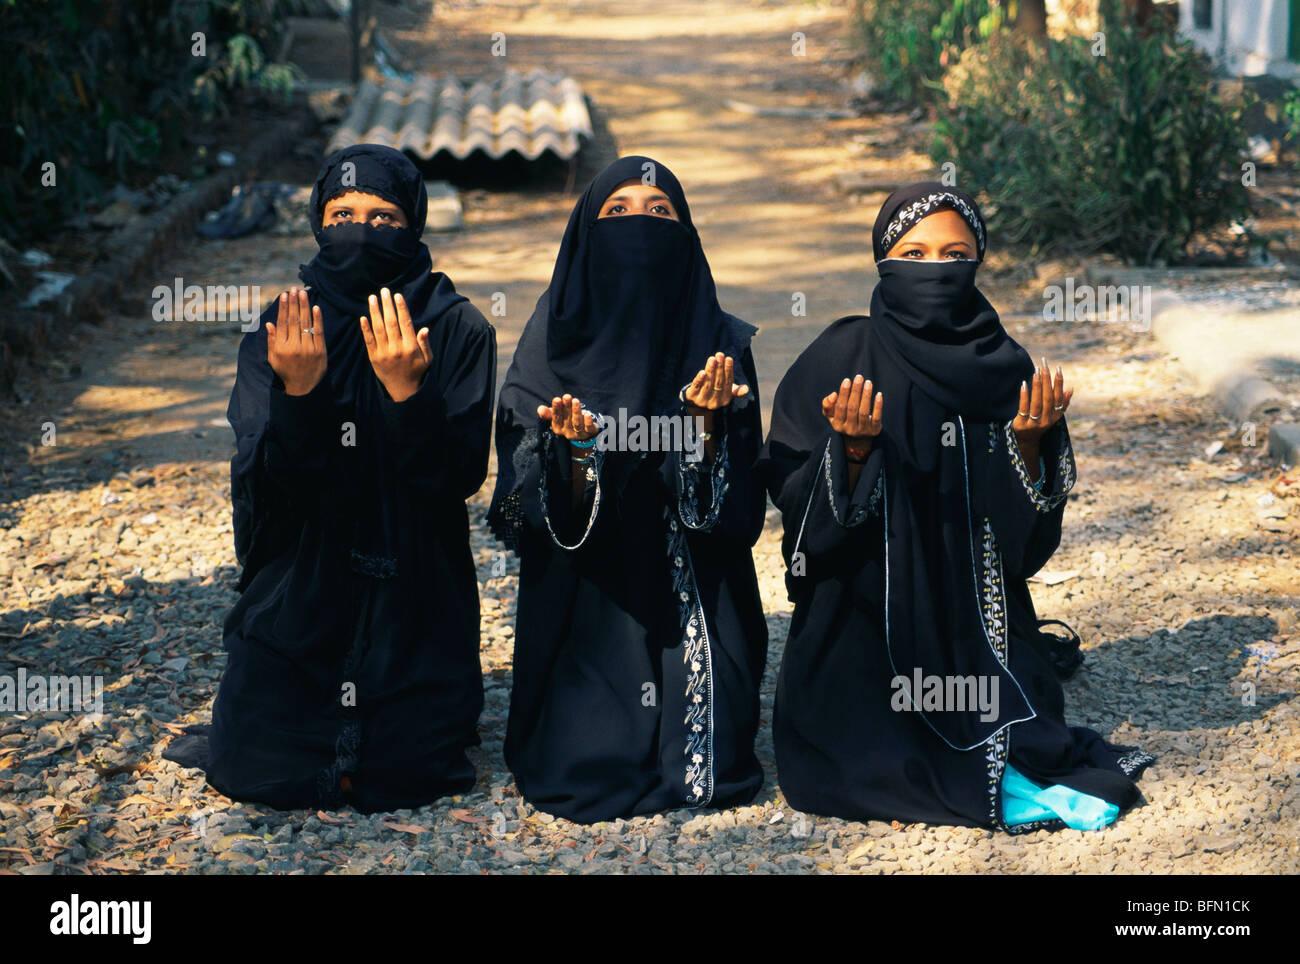 Muslim Women Praying Namaz Stock Photos & Muslim Women Praying Namaz